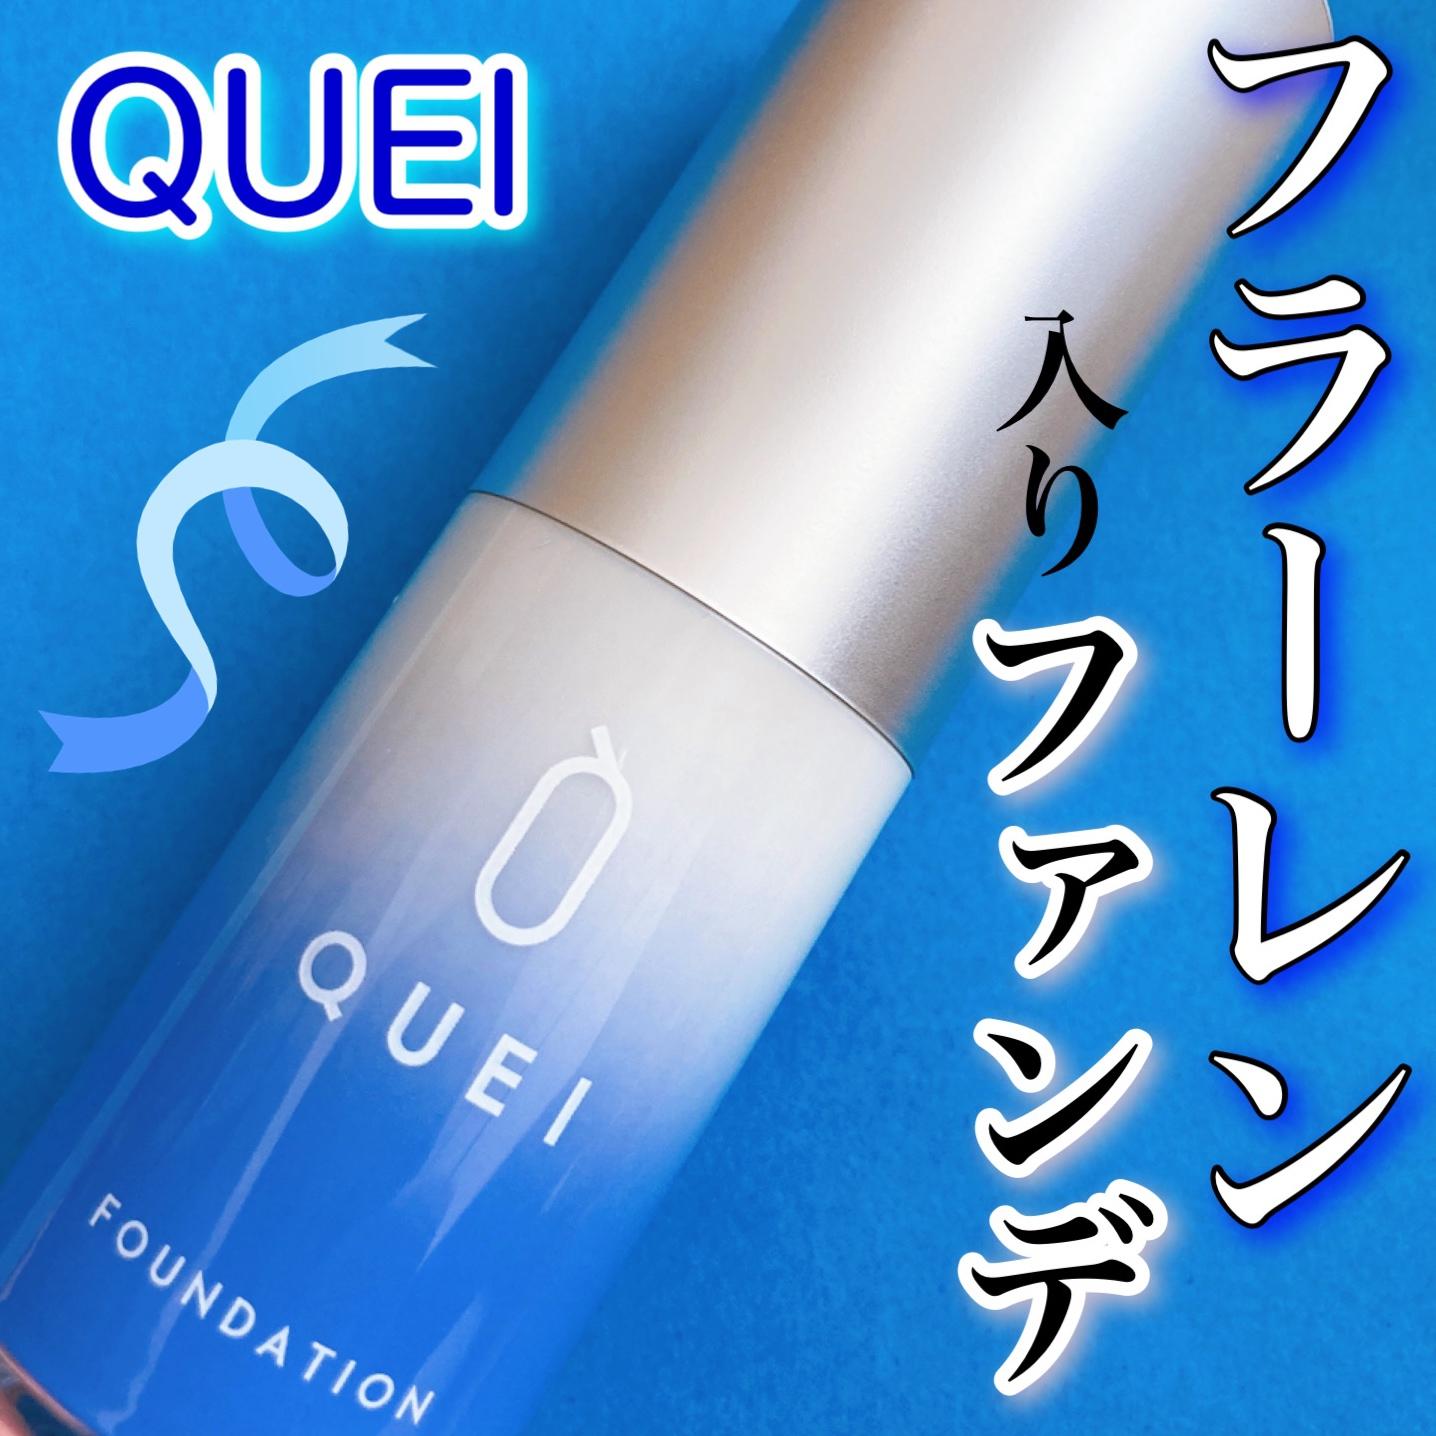 QUEI(クエイ) カラーチェンジファンデーションの良い点・メリットに関するyunaさんの口コミ画像1